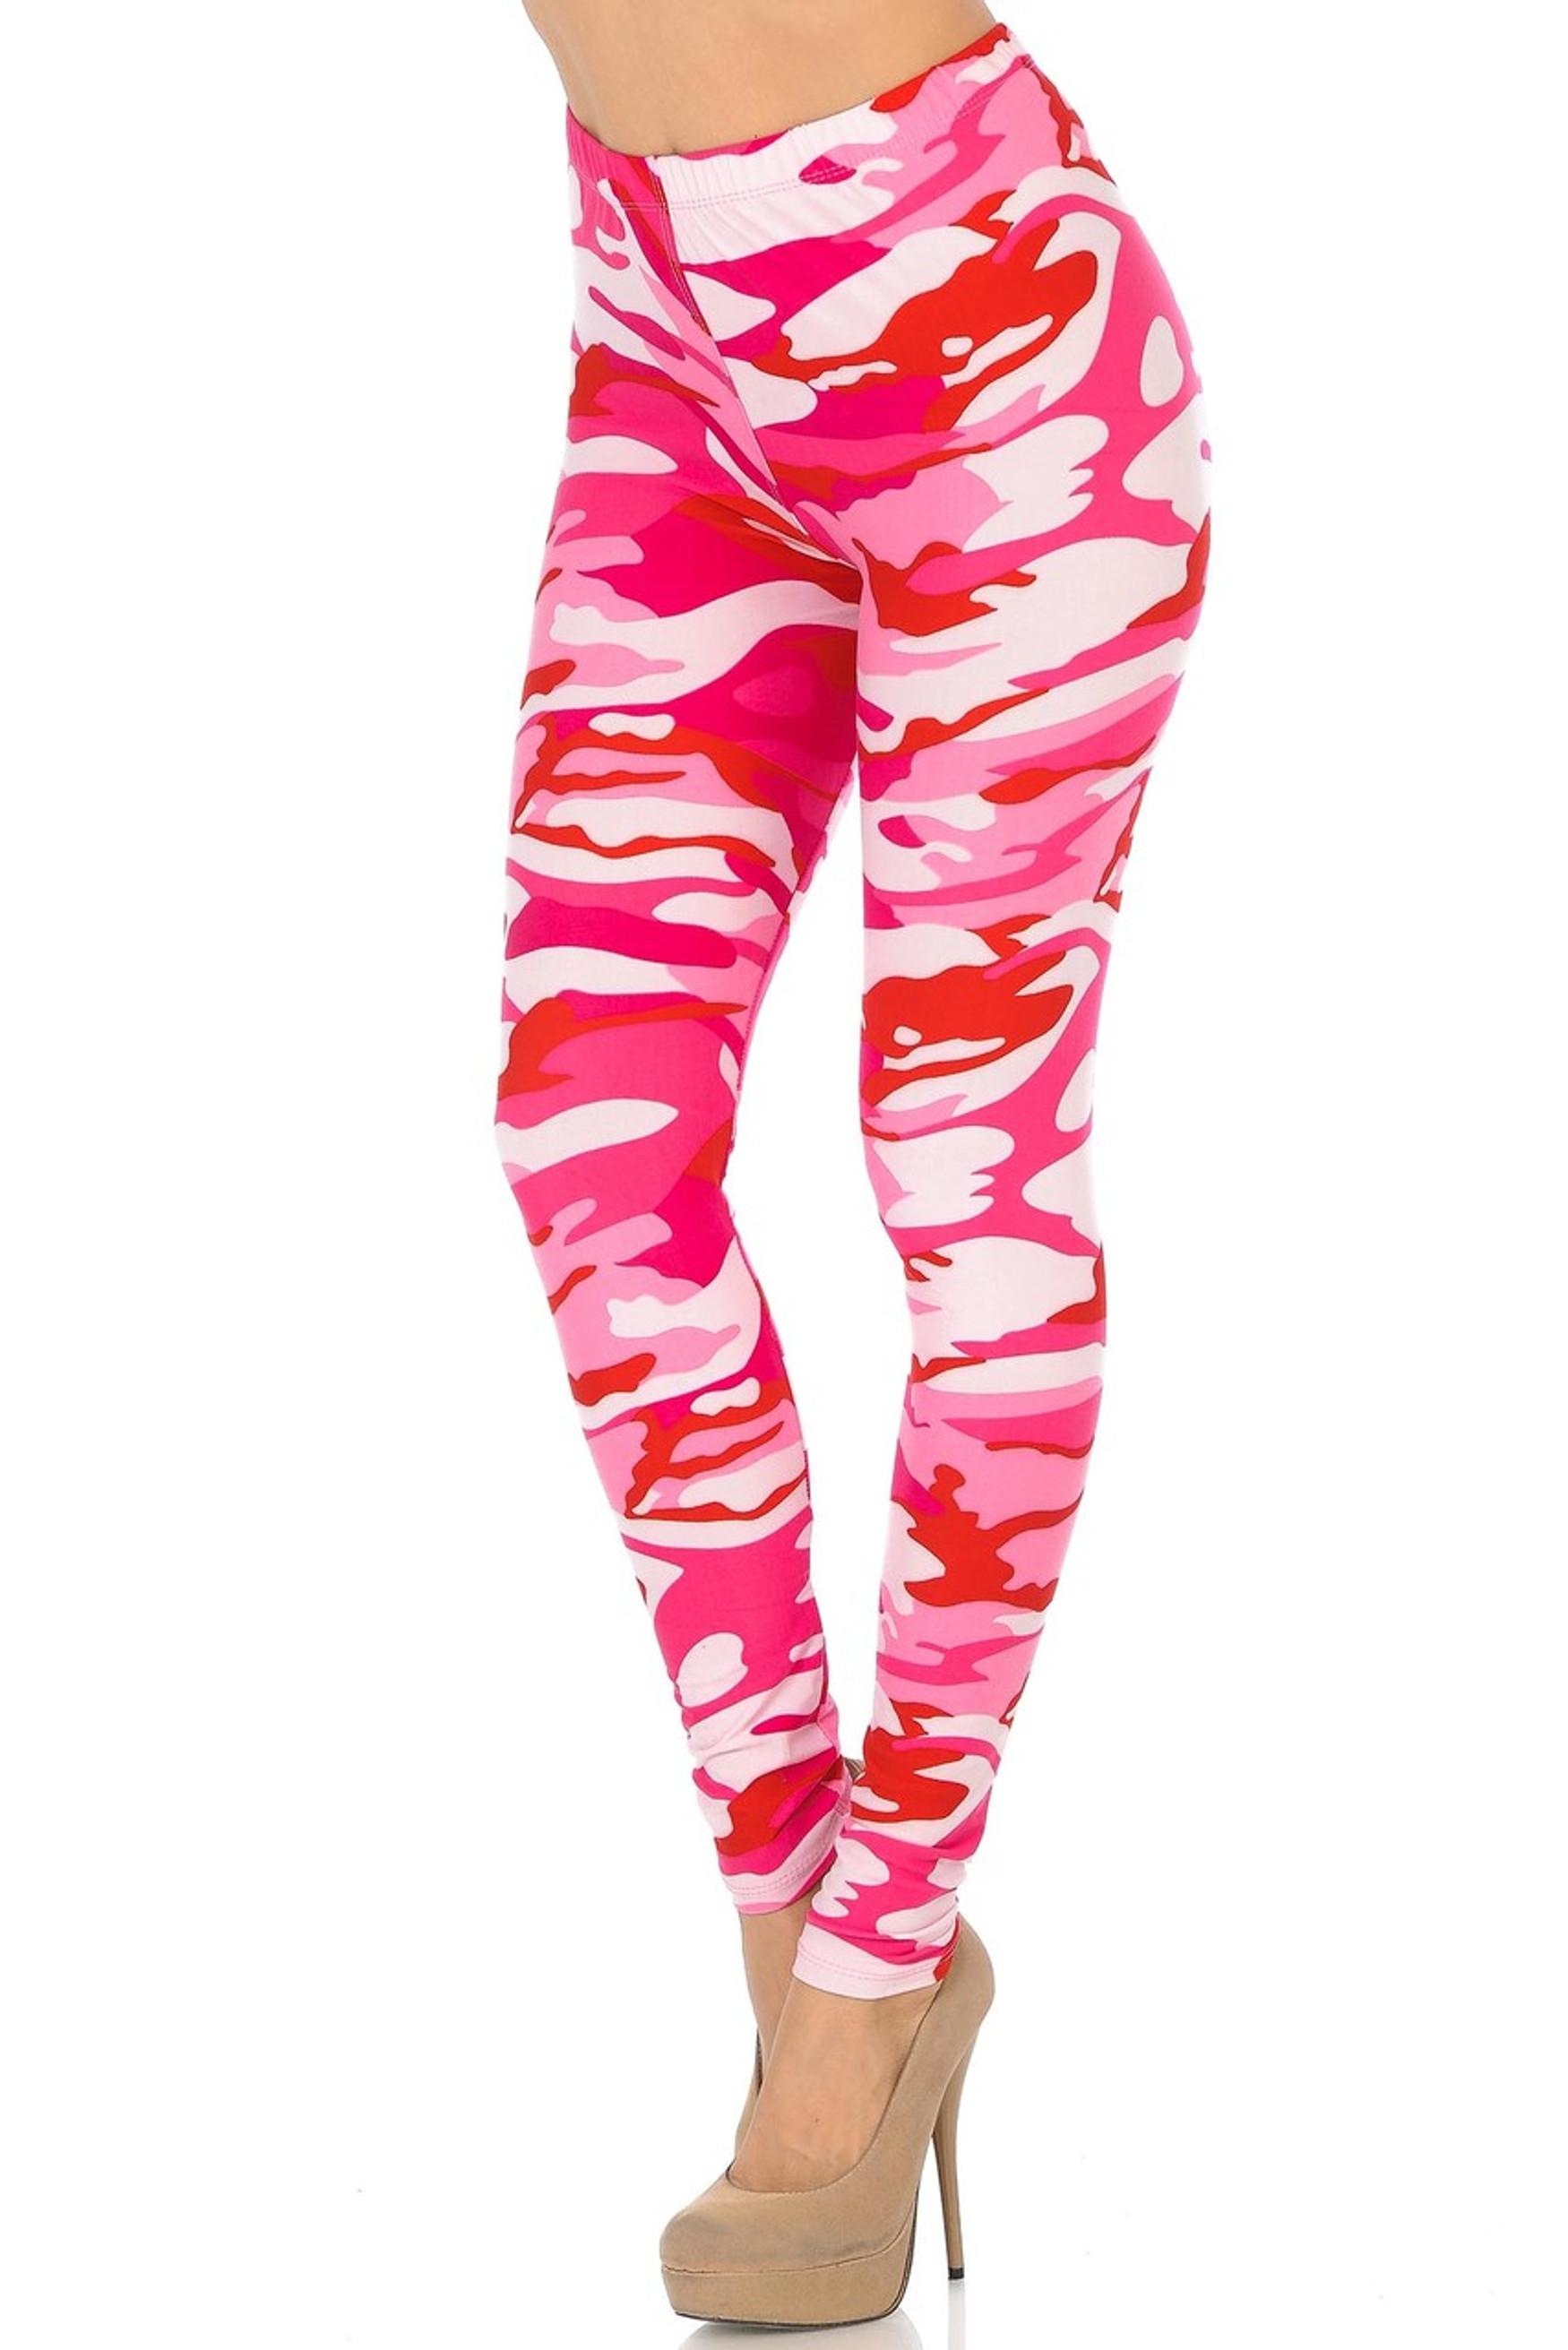 Brushed Pink Camouflage Plus Size Leggings